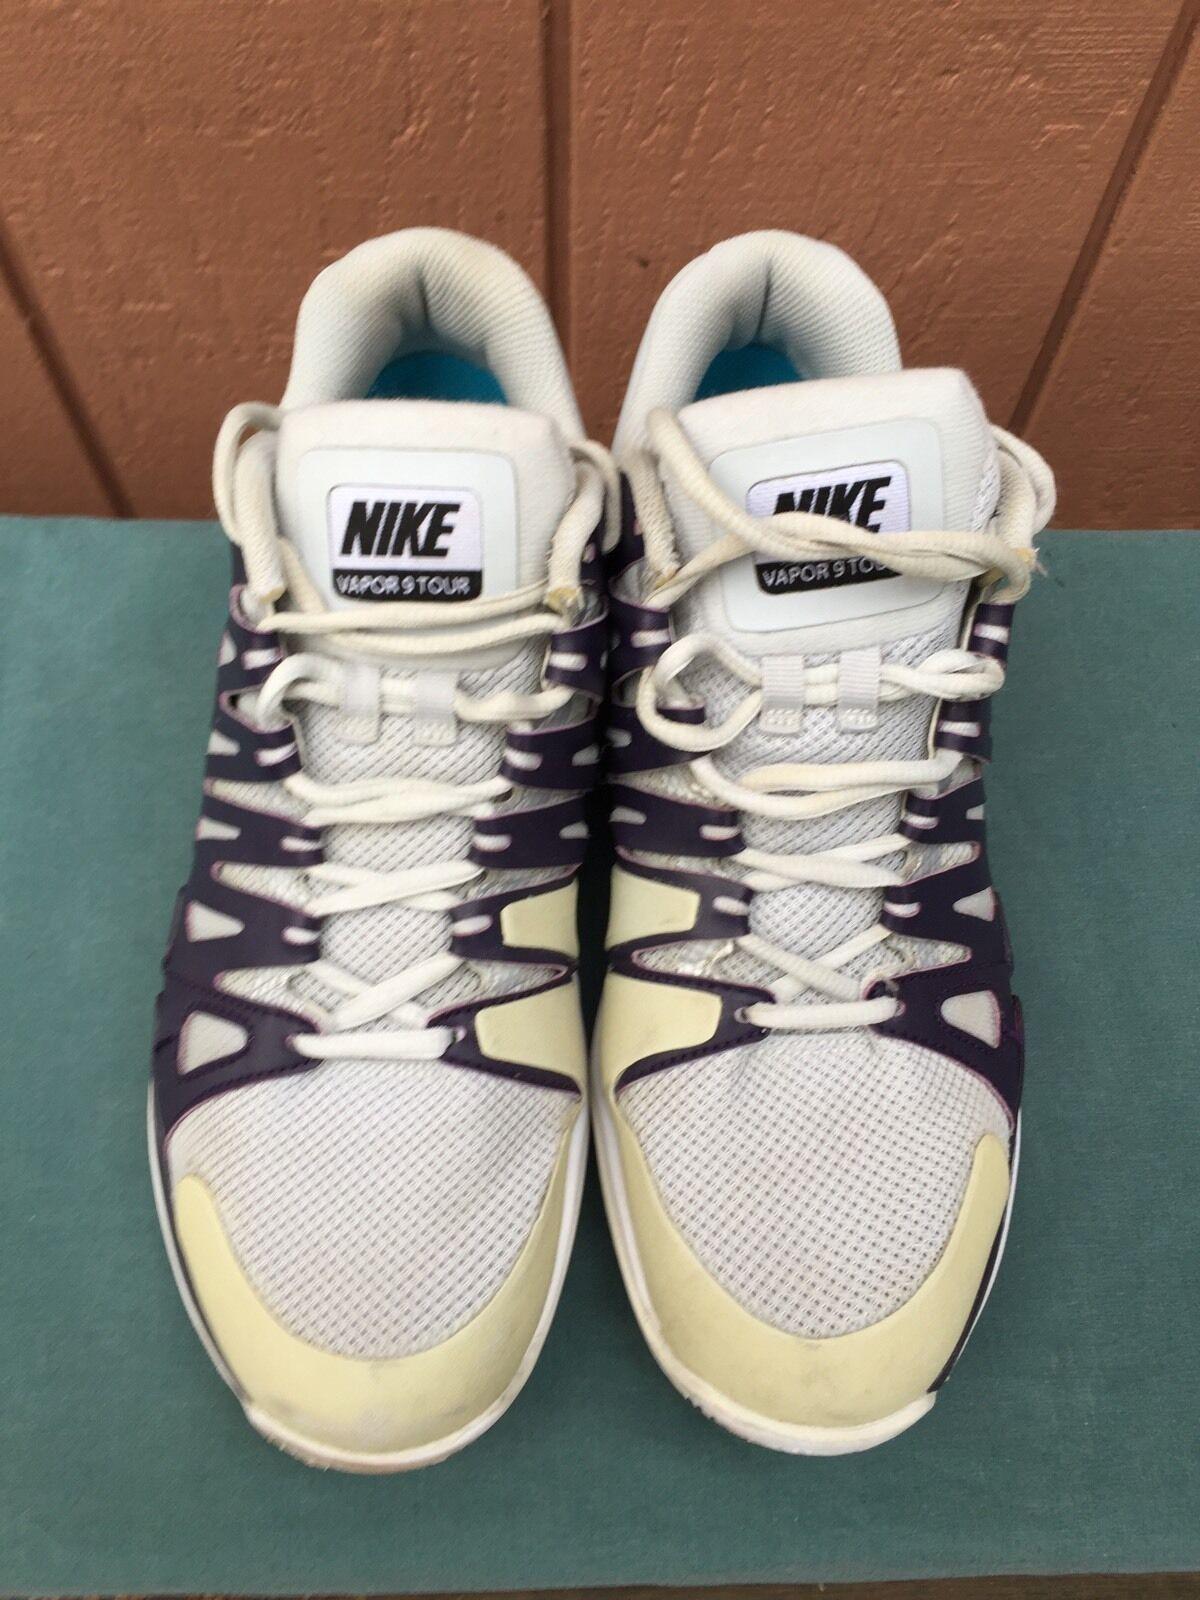 Women's Nike Zoom Vapor 9 Tour Tennis Shoes Sneakers 543222-045 US Sz 9  Brand discount